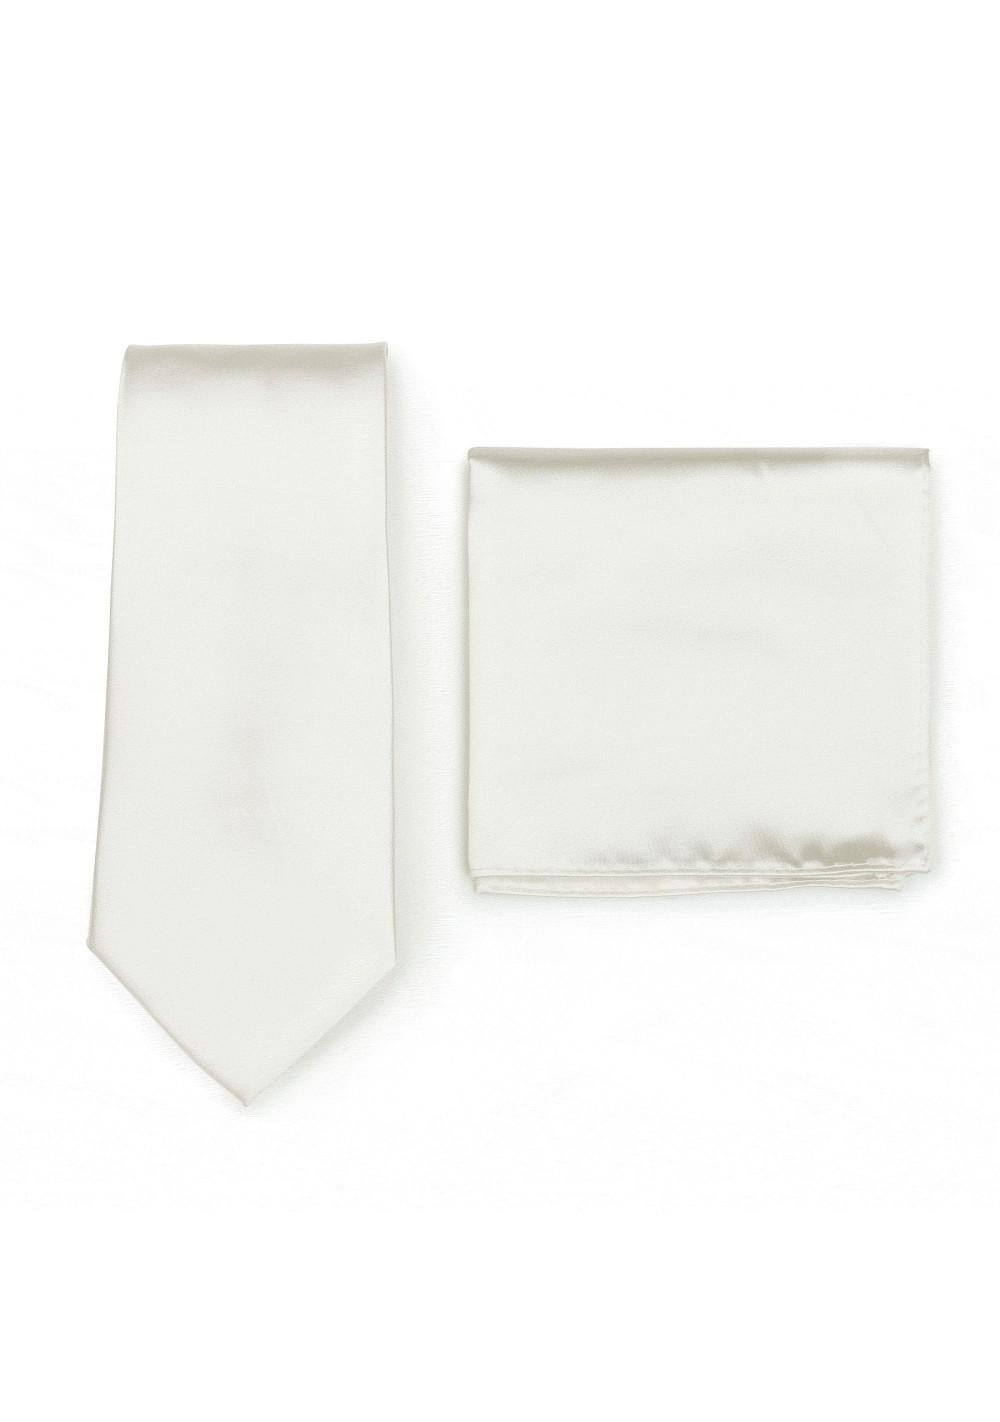 Solid Satin Tie Set in Solid Cream